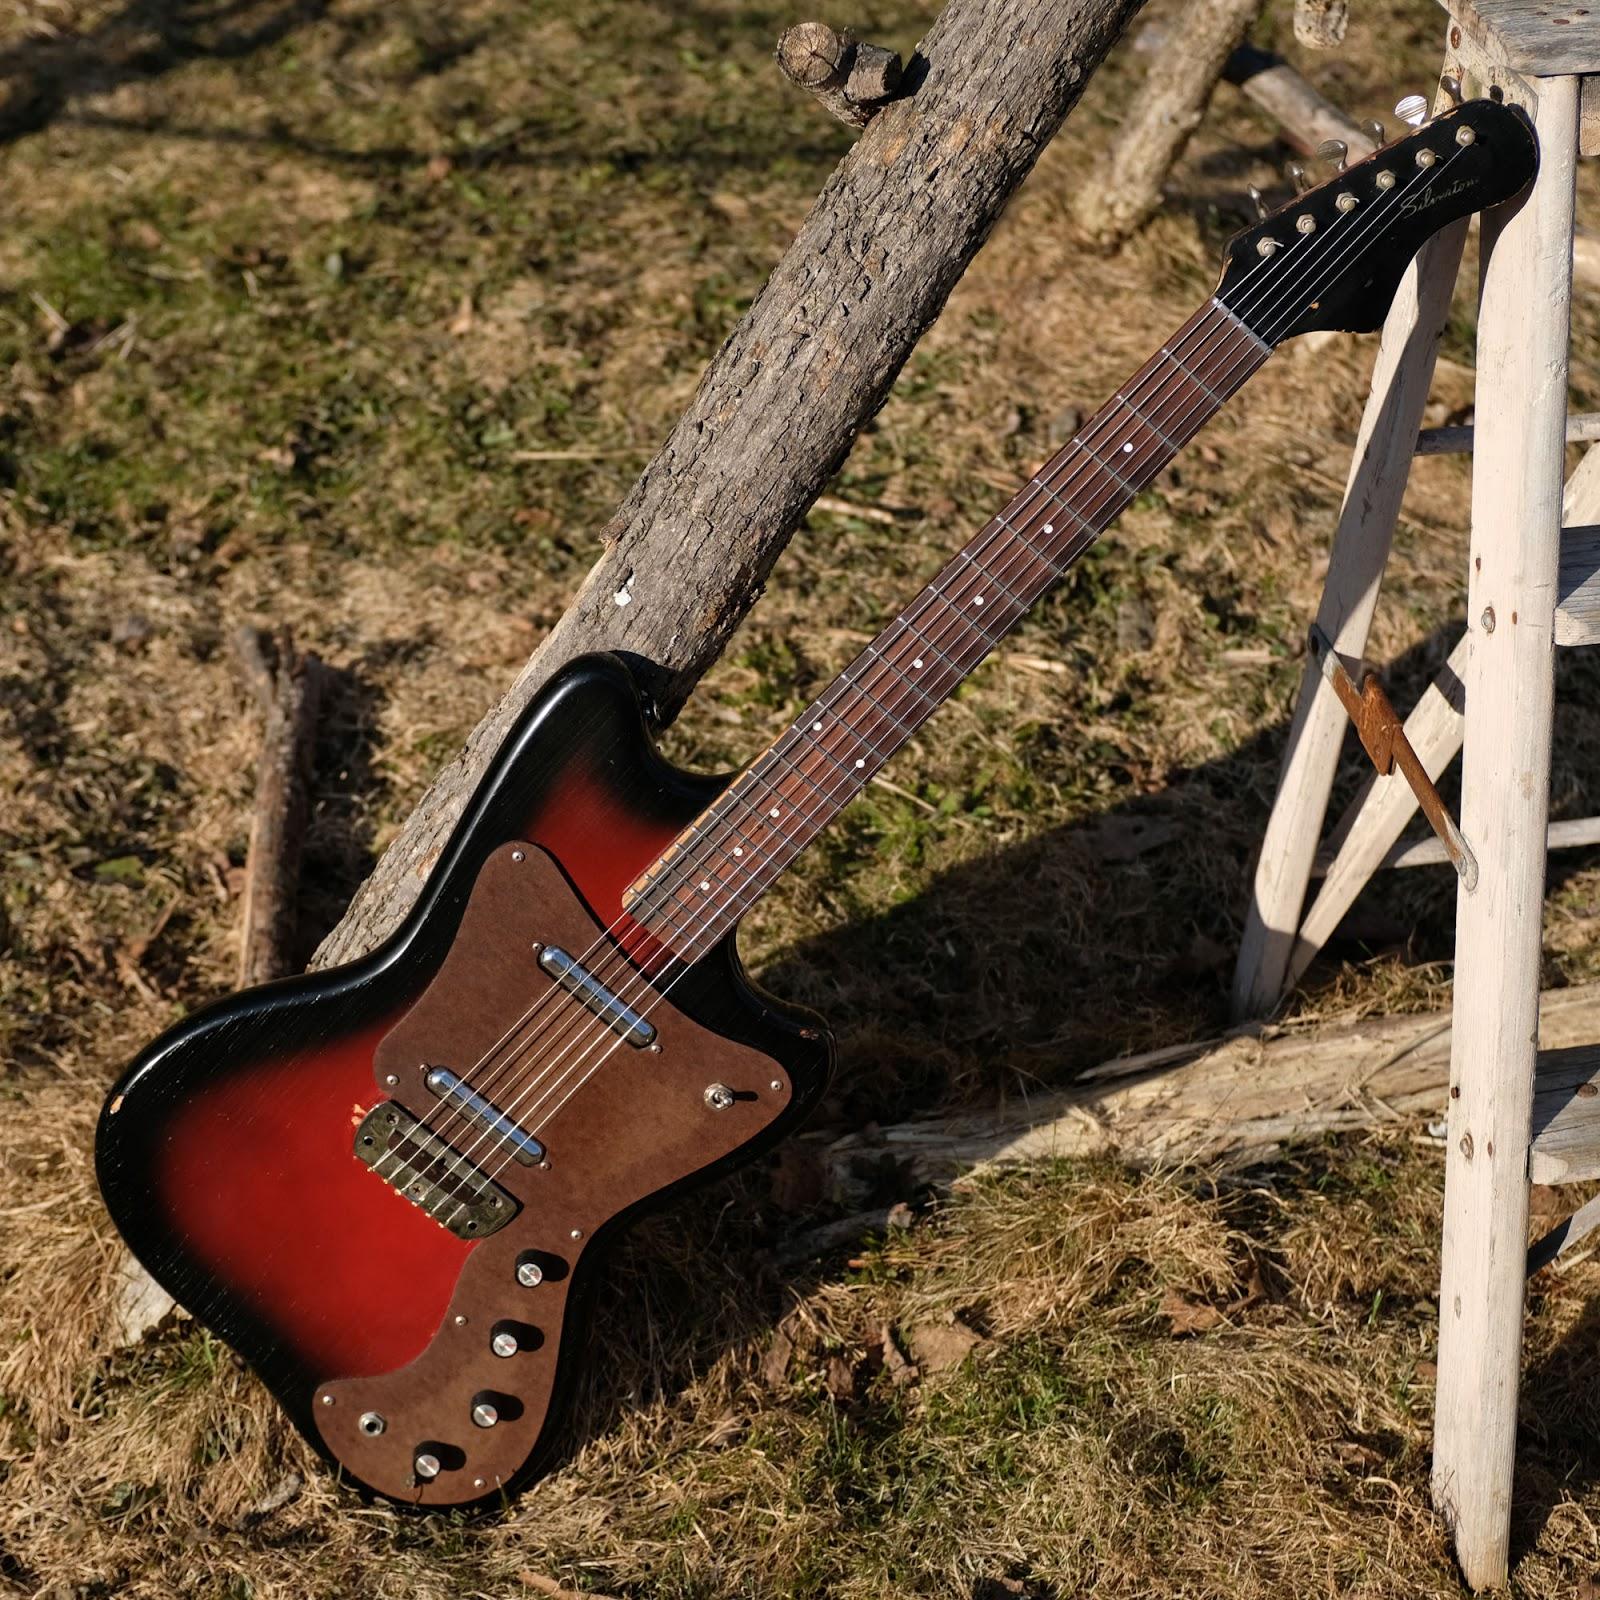 1967 danelectro made silvertone 1452 hornet electric guitar [ 1600 x 1600 Pixel ]